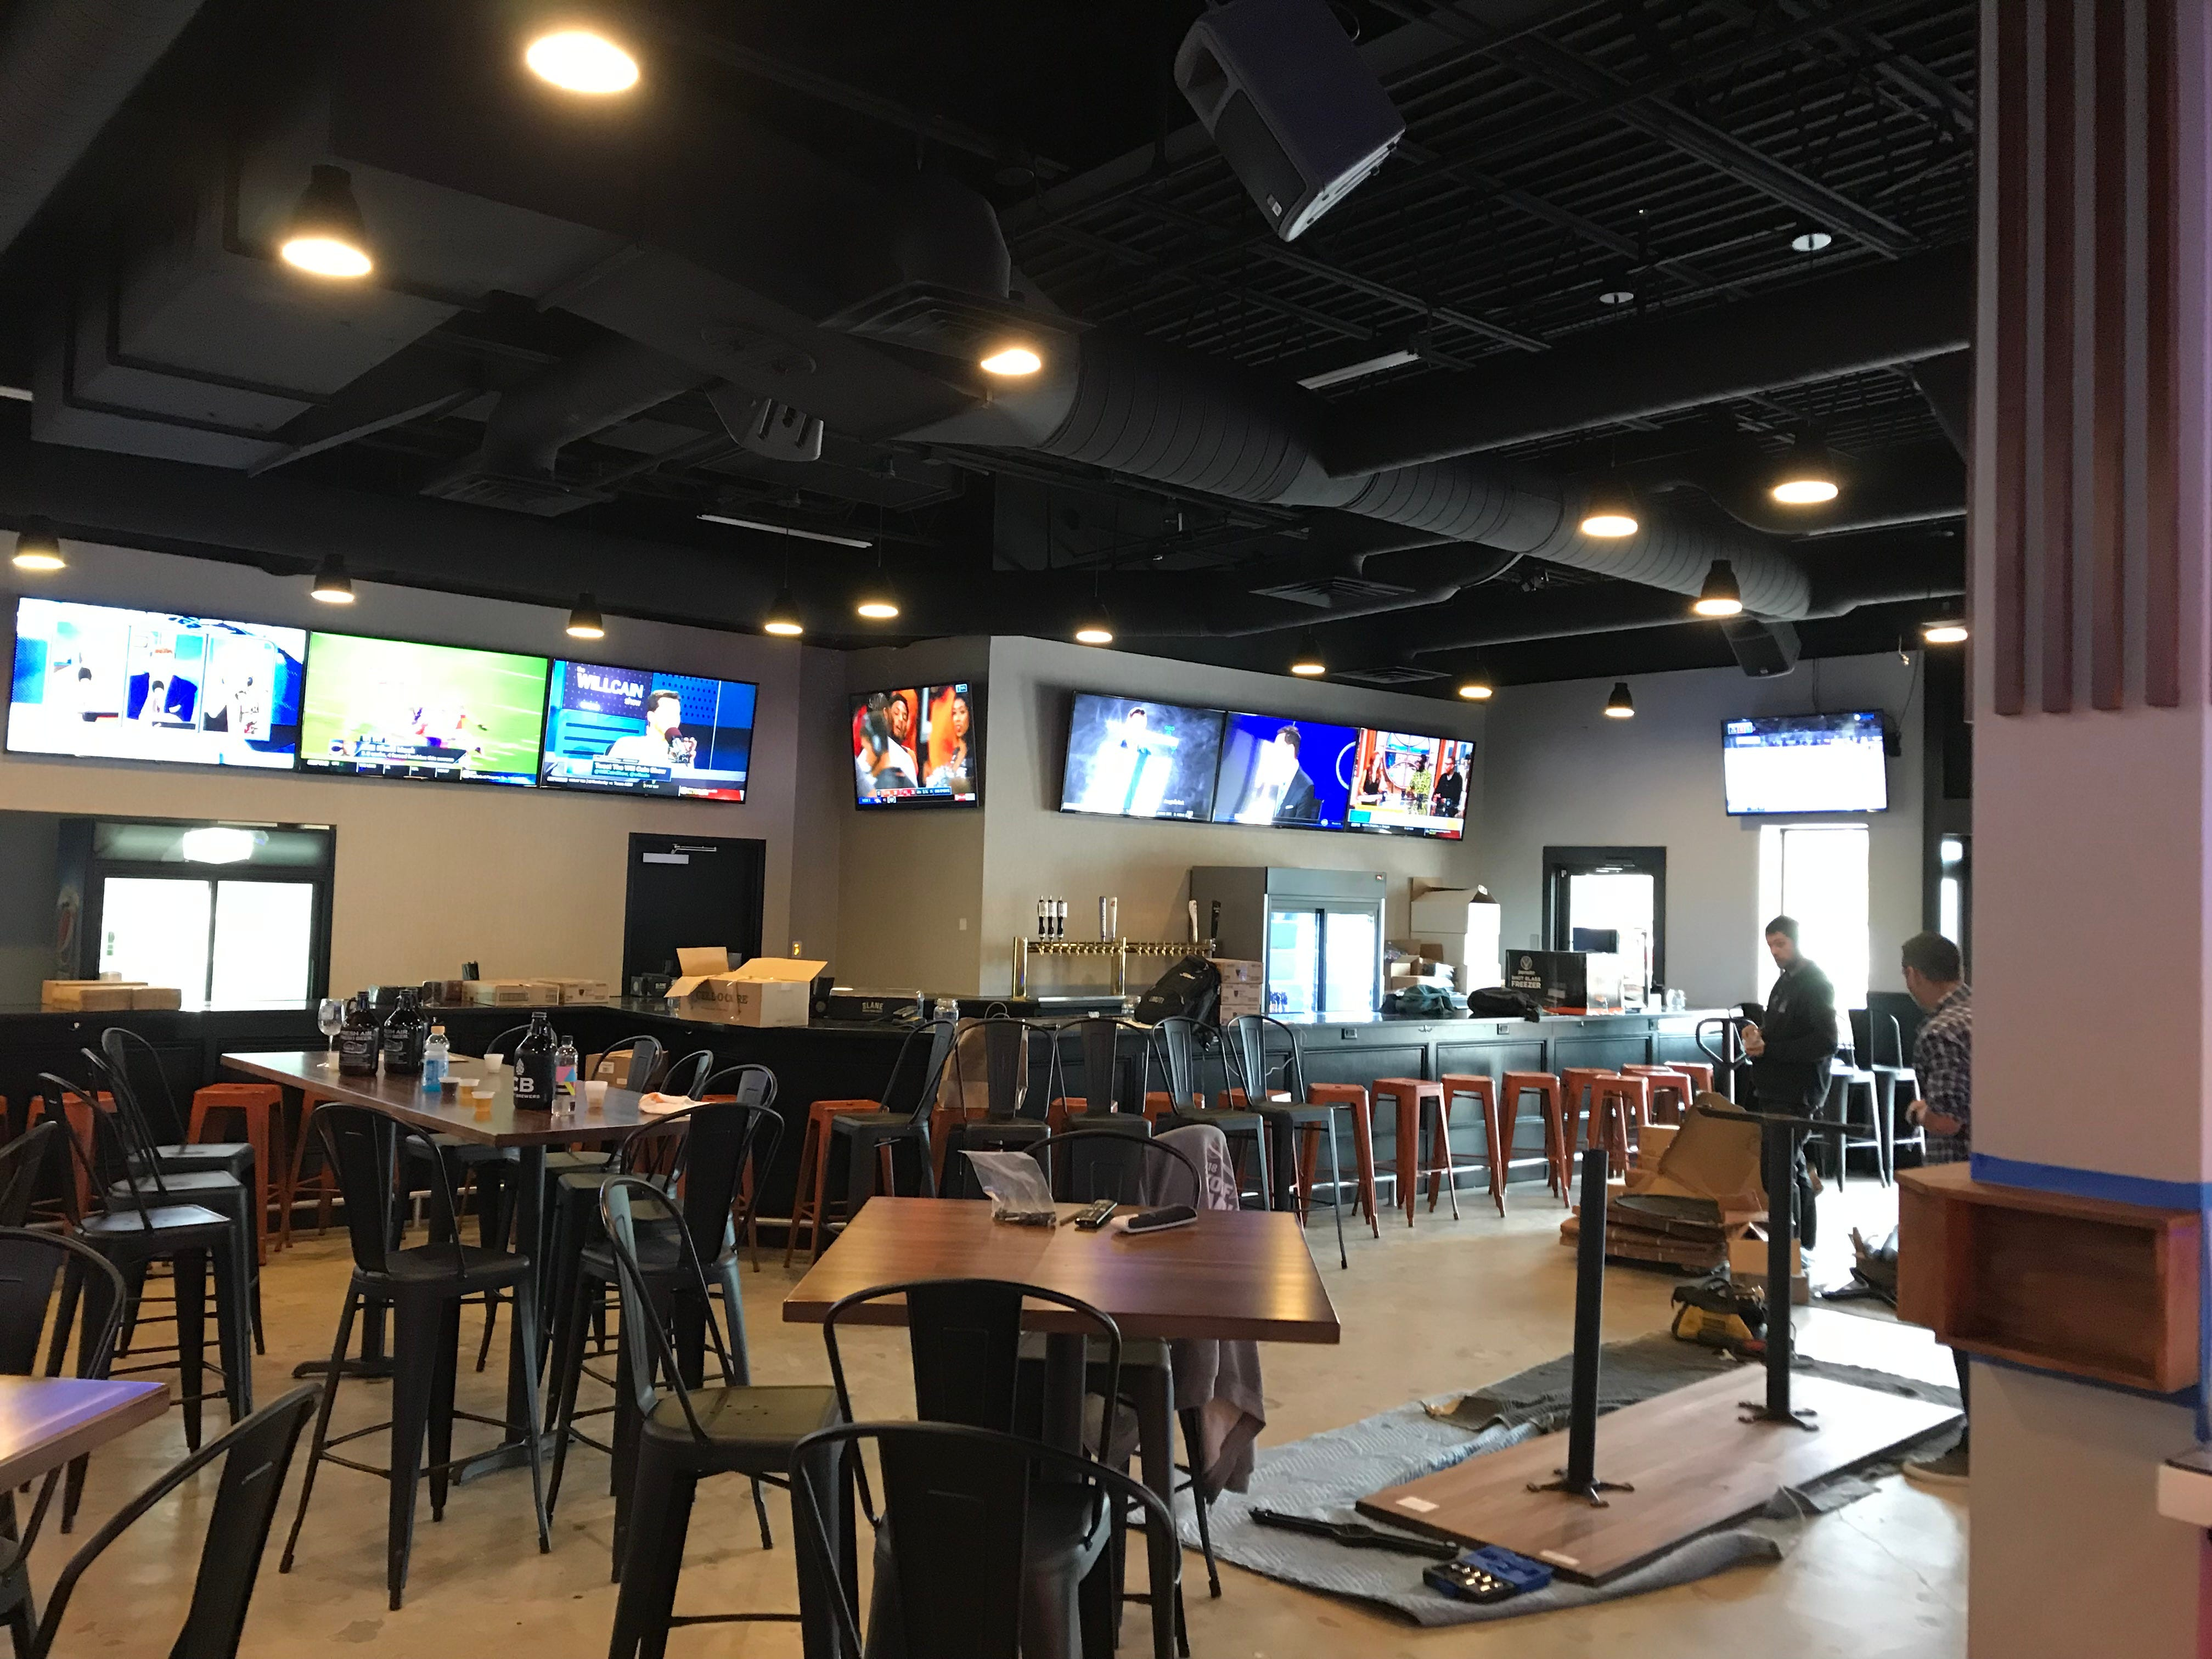 The spacious dining room and bar at Malt + Ember at The Mall at Greece Ridge.